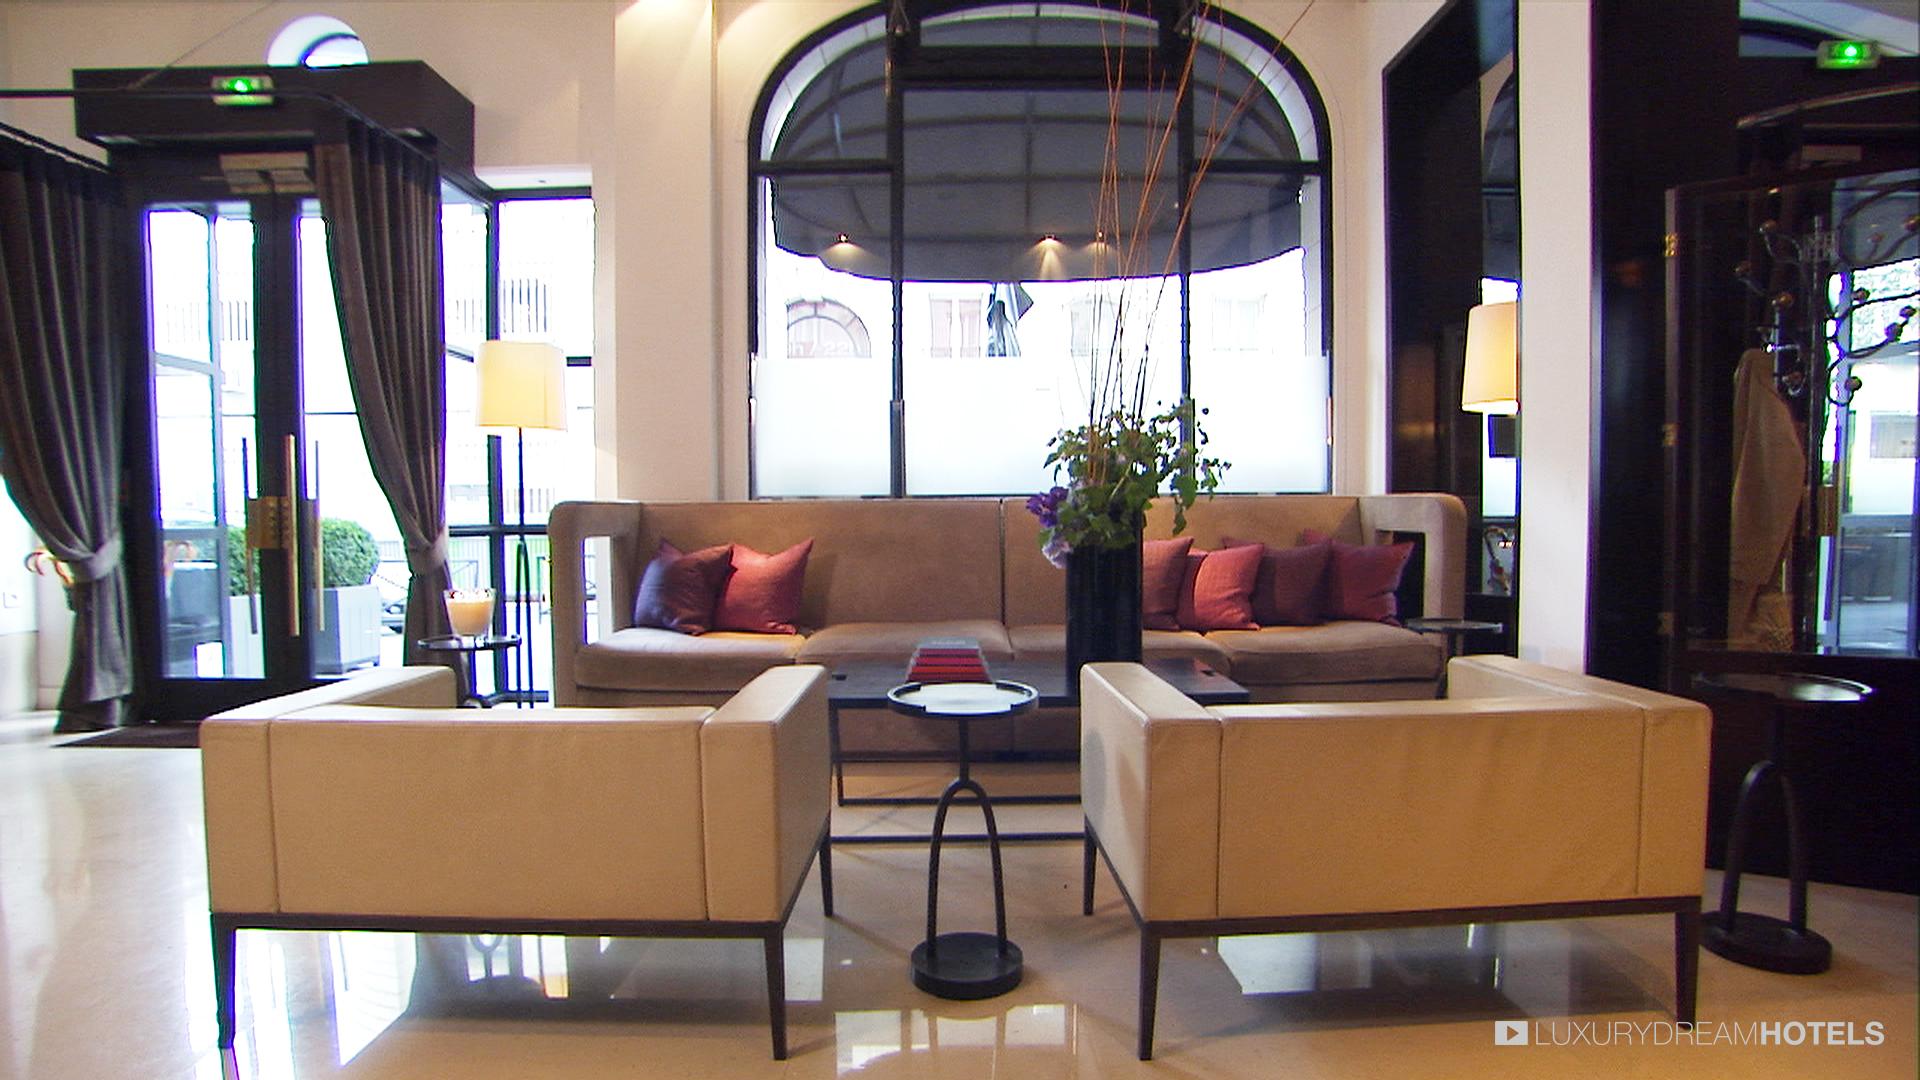 Luxury hotel hotel montalembert paris france luxury dream hotels